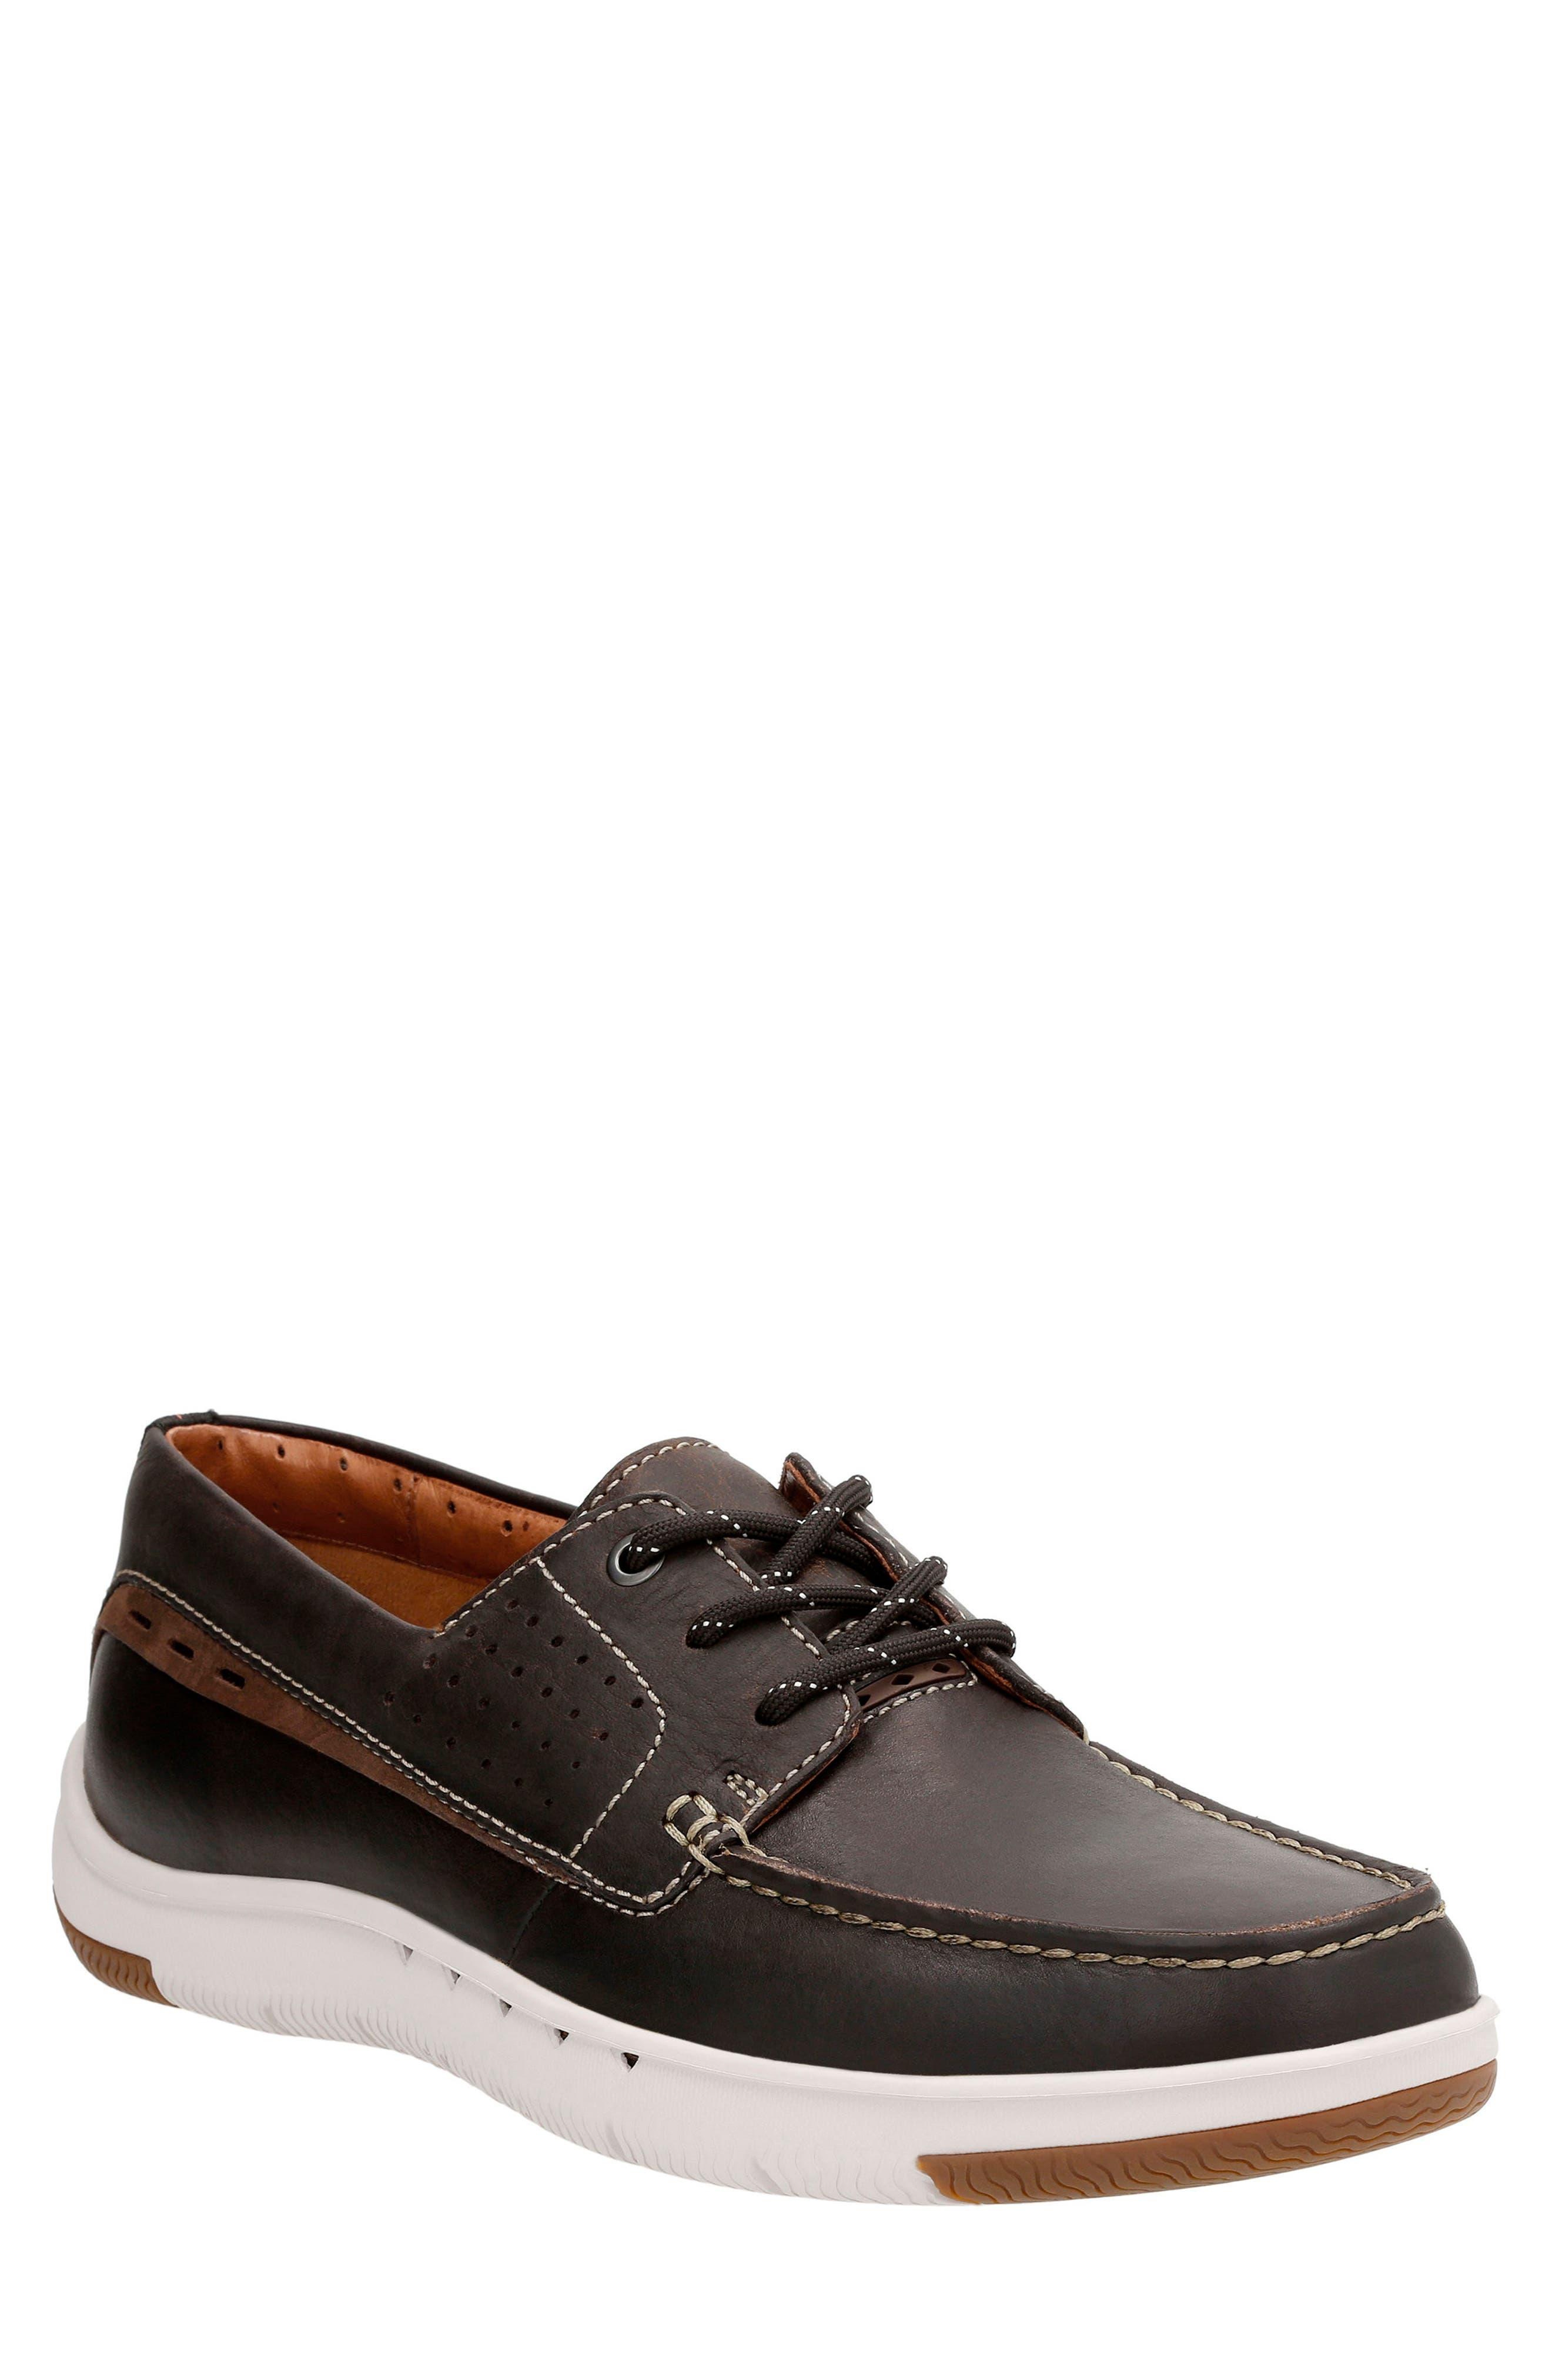 CLARKS<SUP>®</SUP> Un.Maslow Sneaker